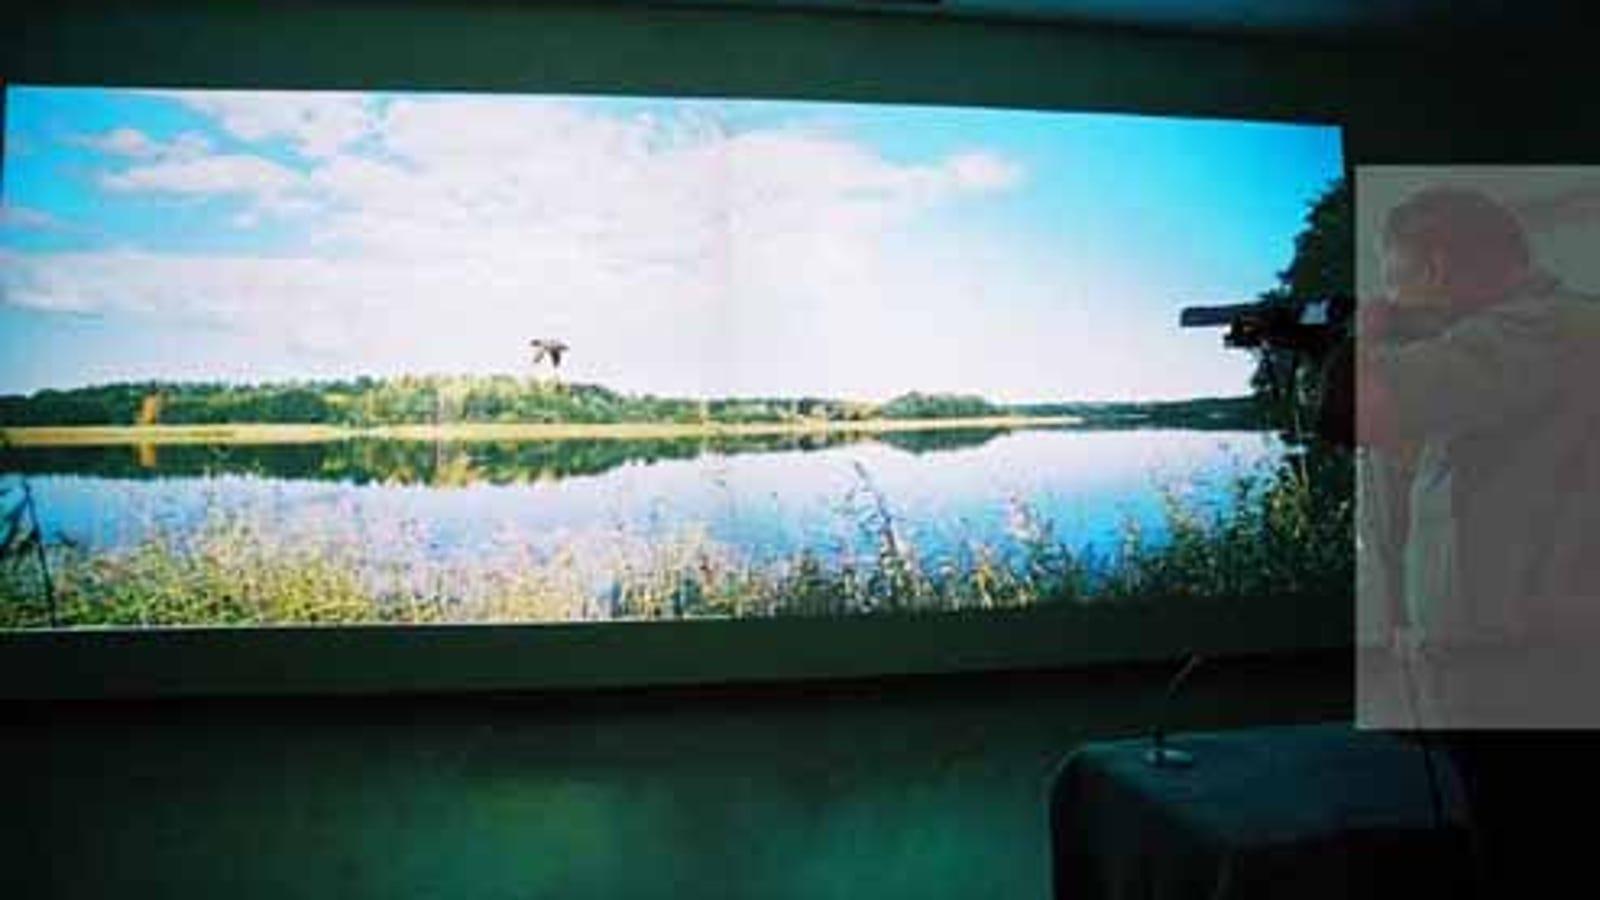 ST-2 Indoor Shooting Simulator Is Duck Hunt on Steroids